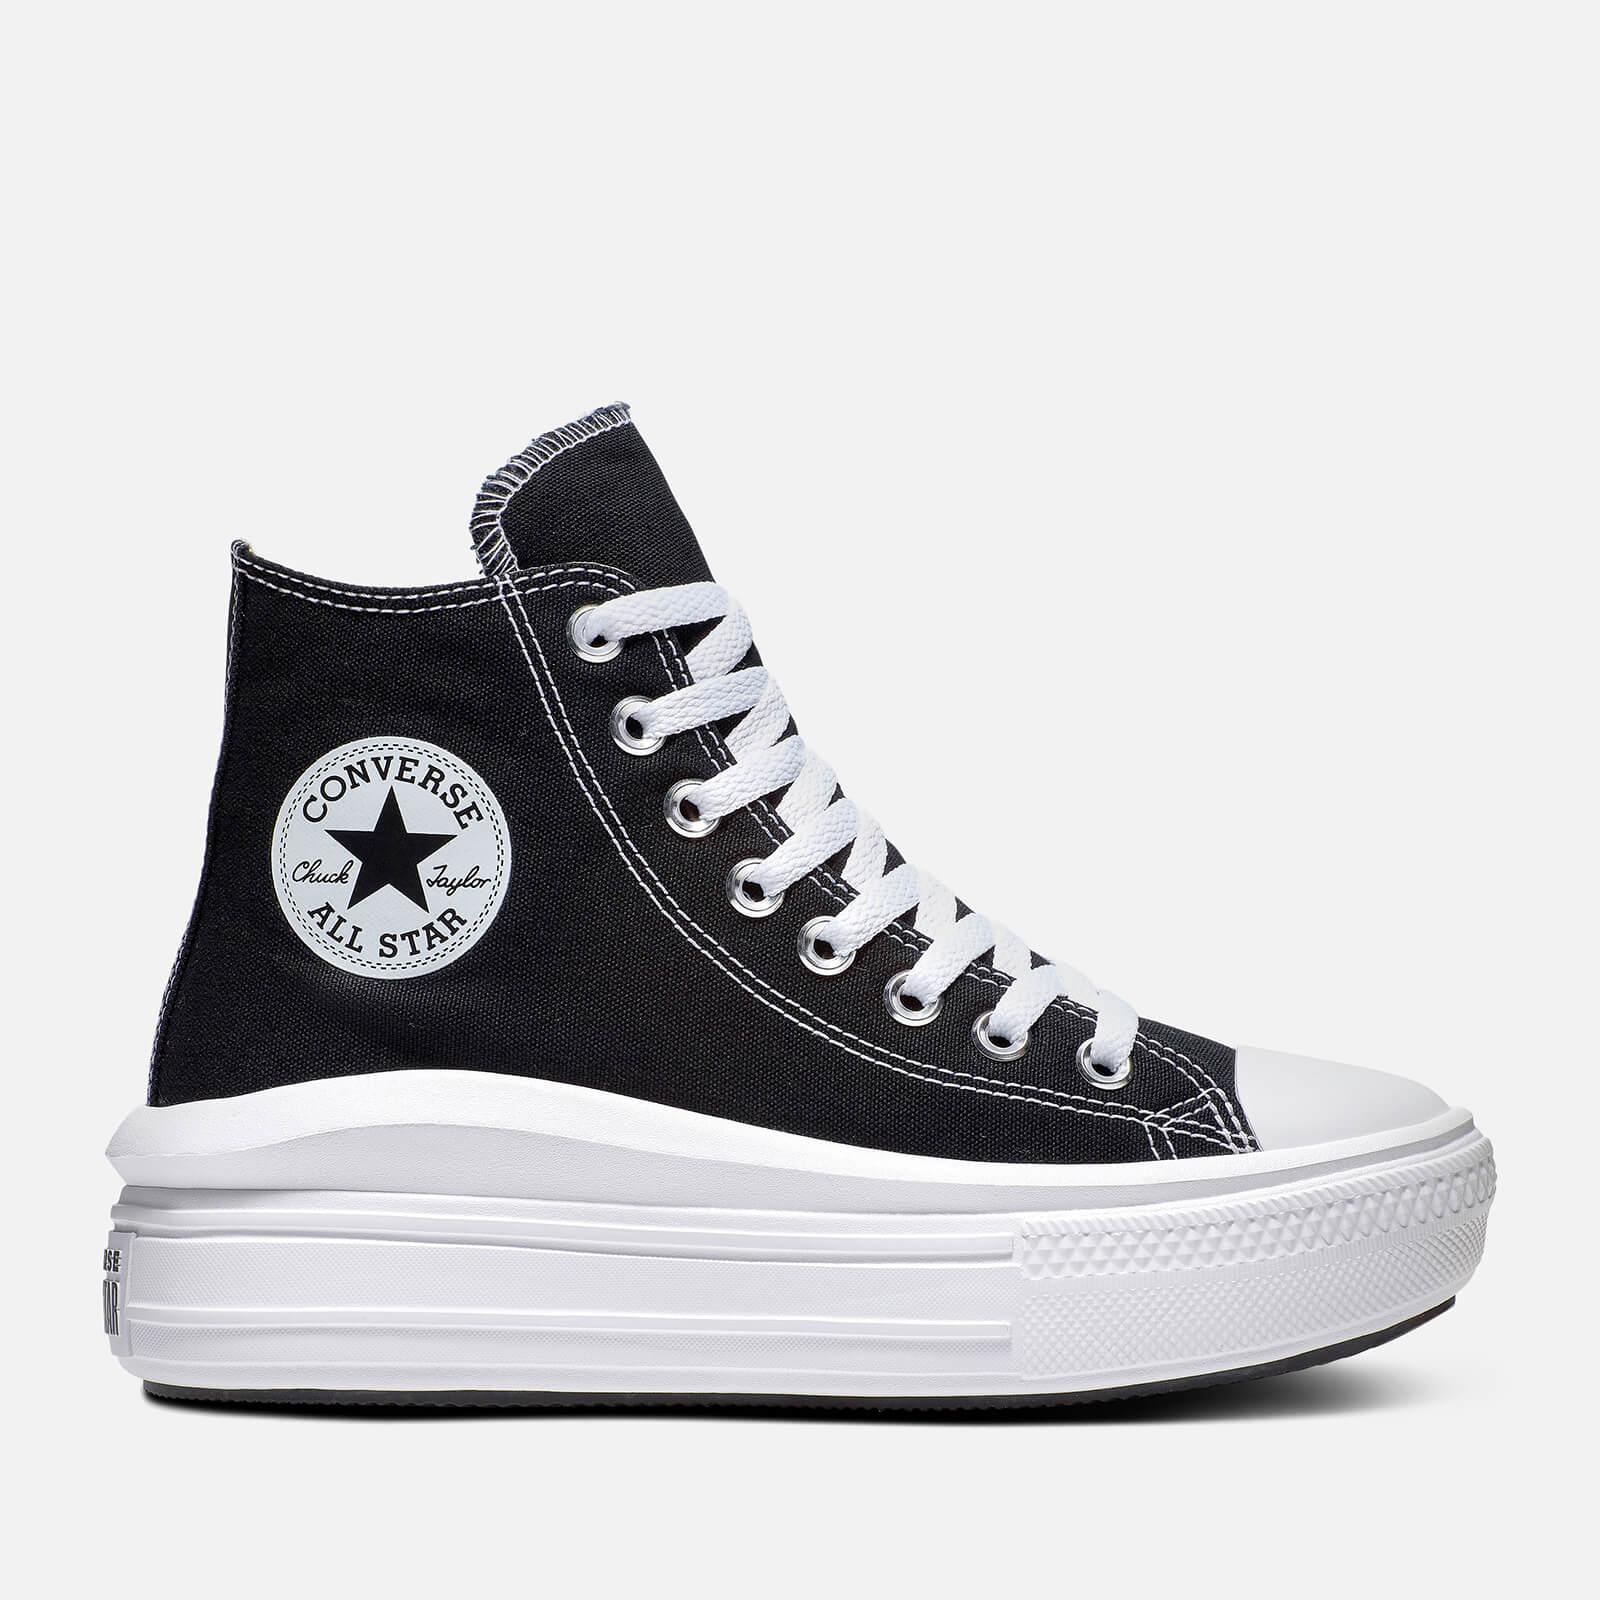 Converse All Star Move 厚底帆布鞋